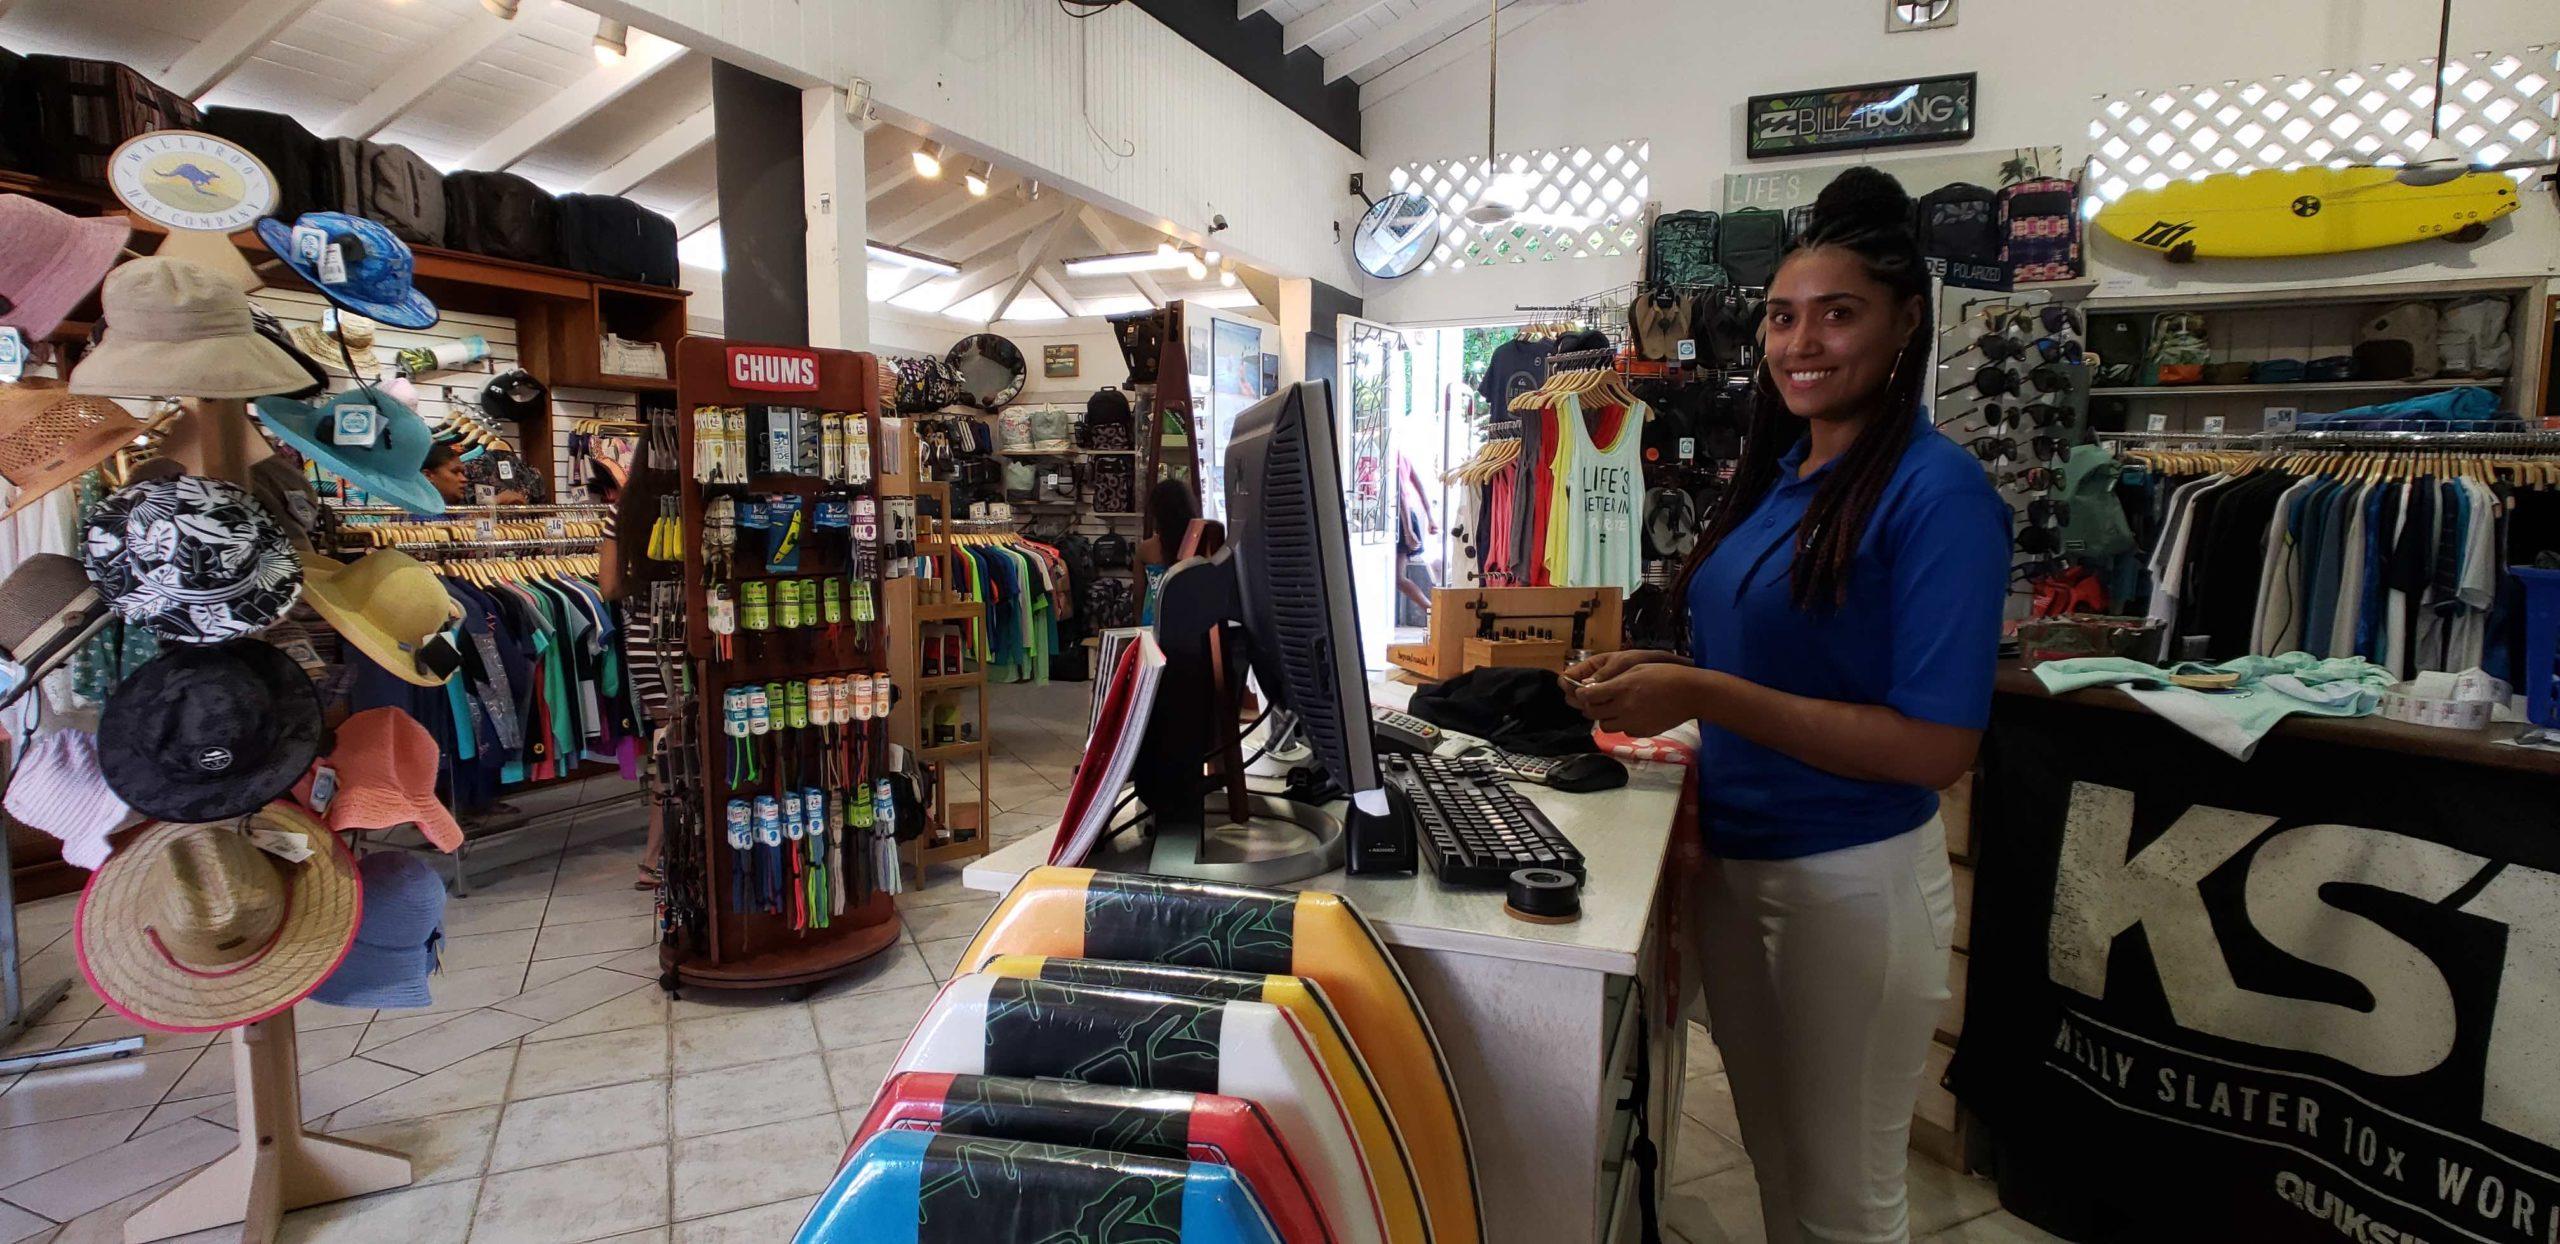 My favorite cashier